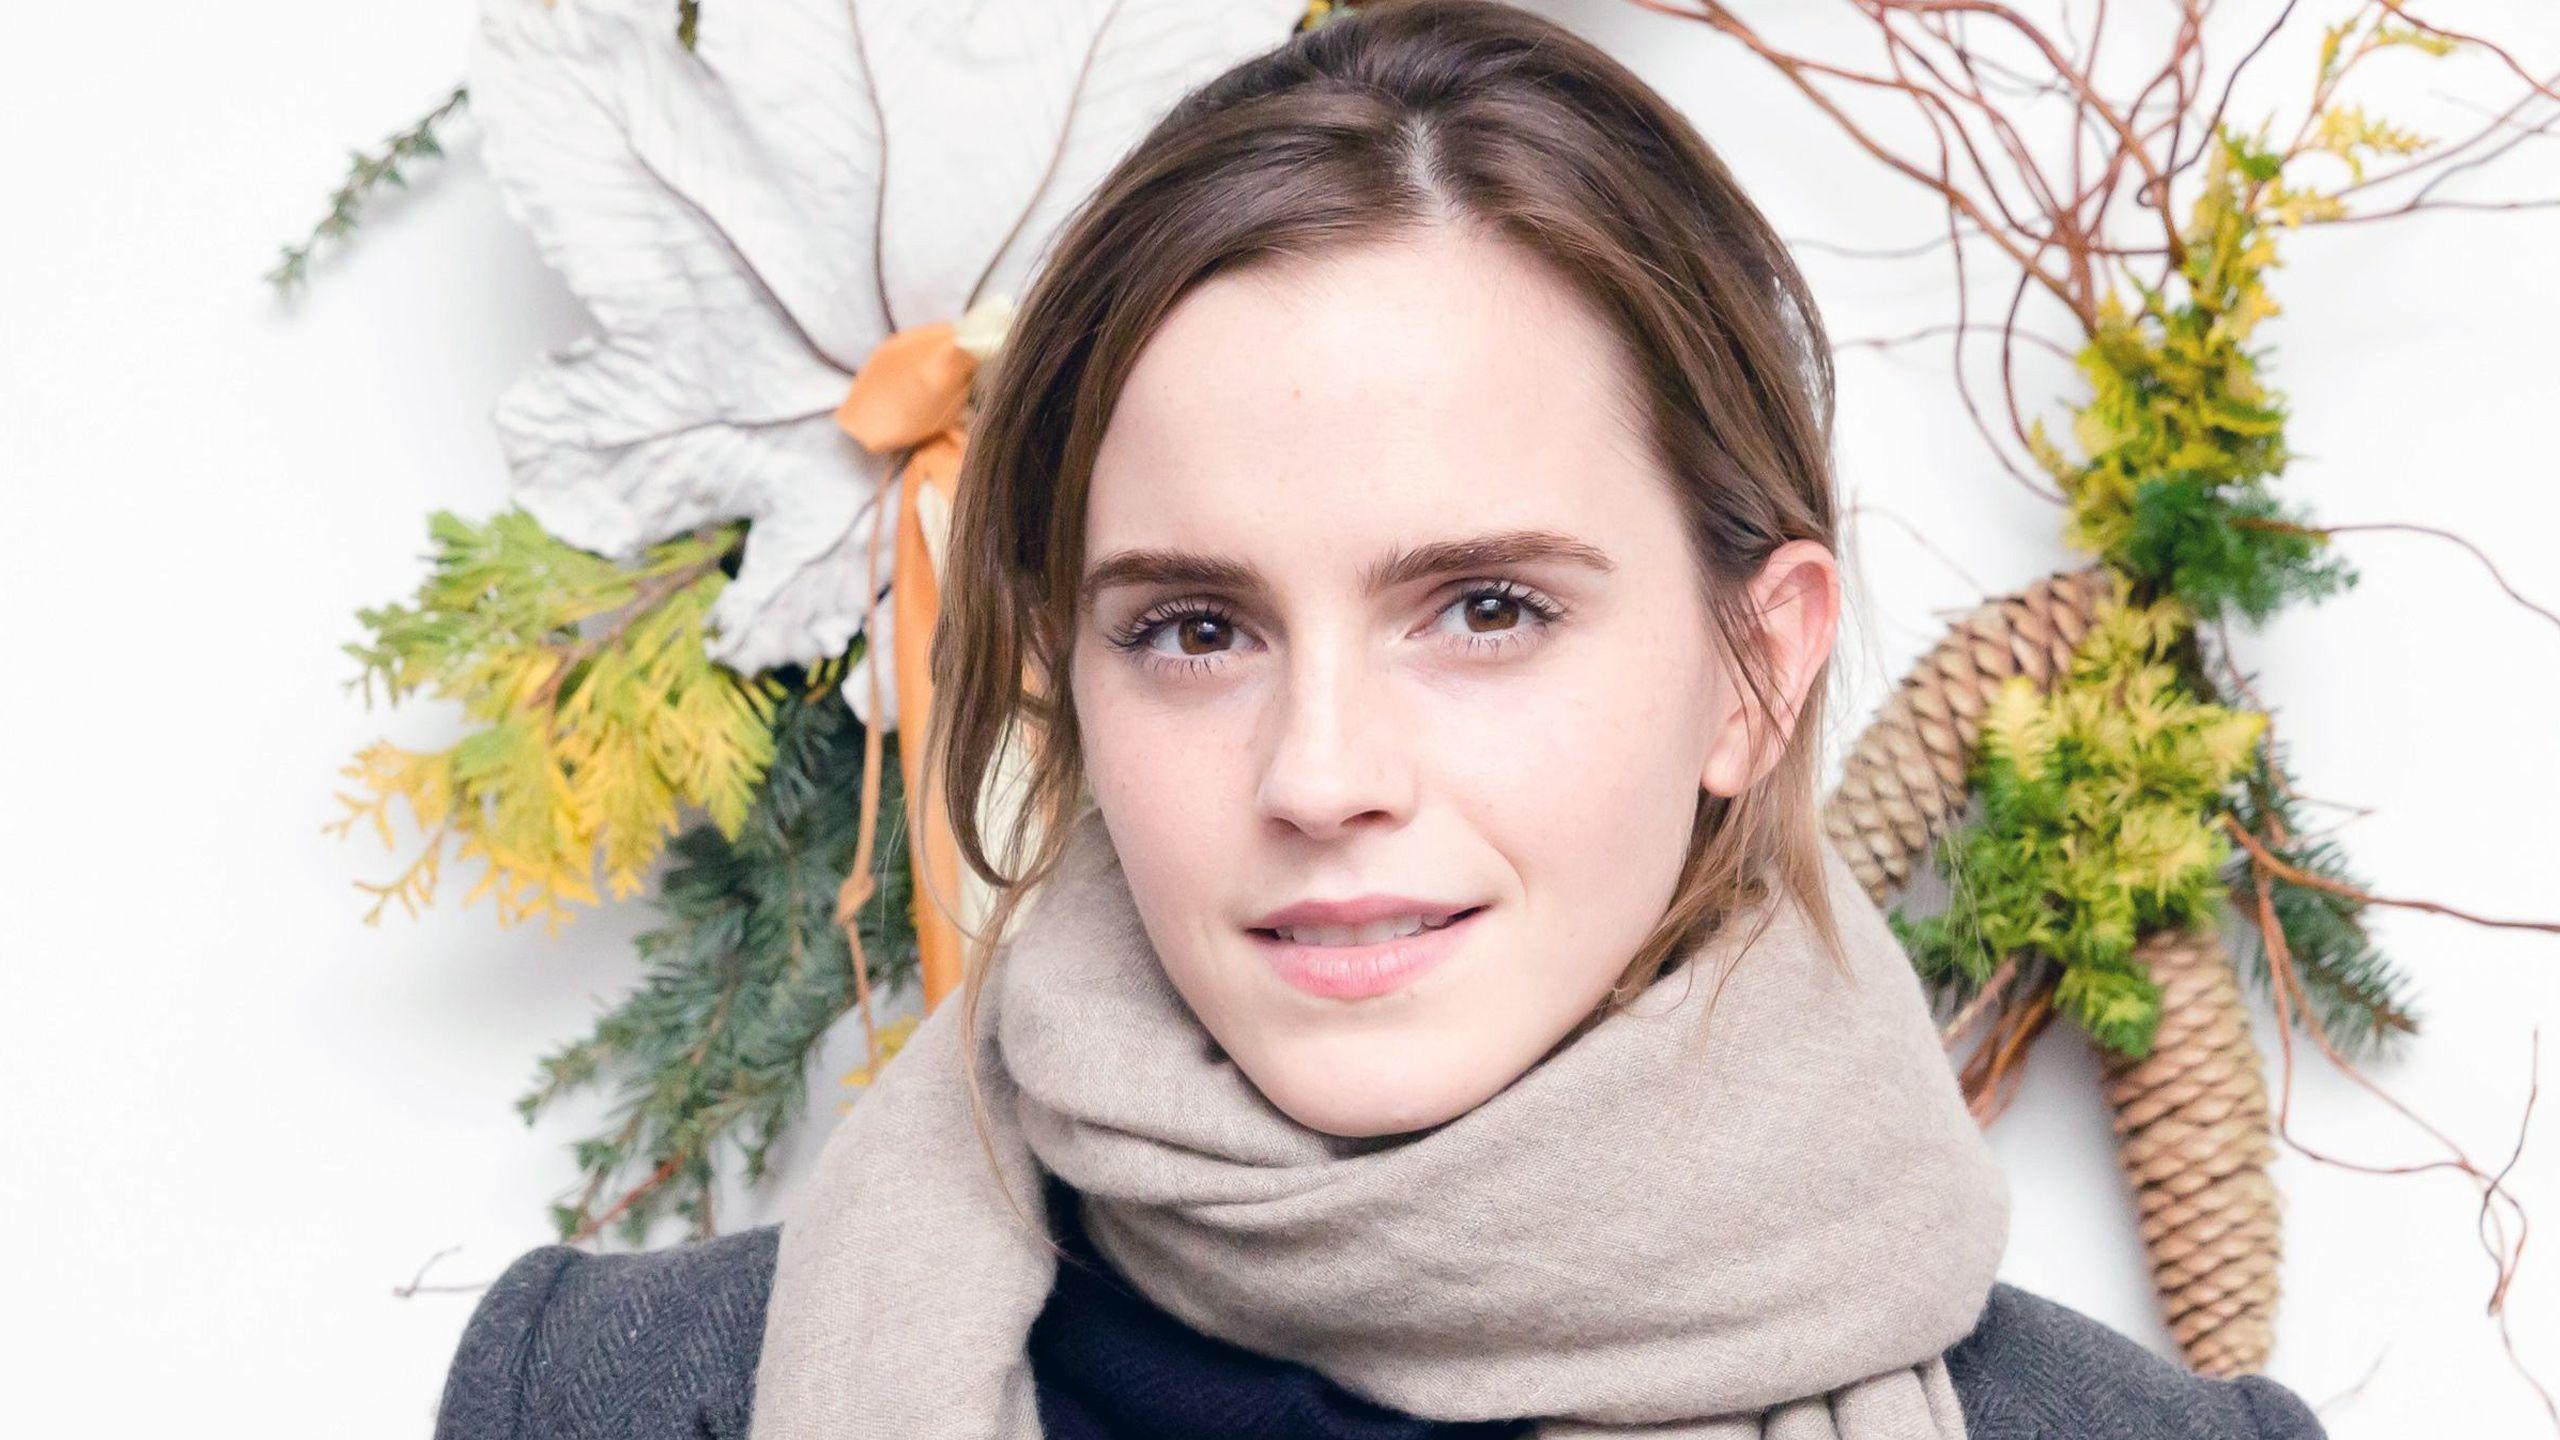 Emma Watson Hd Wallpapers 2 Beautiful Wallpaper Pinterest Emma